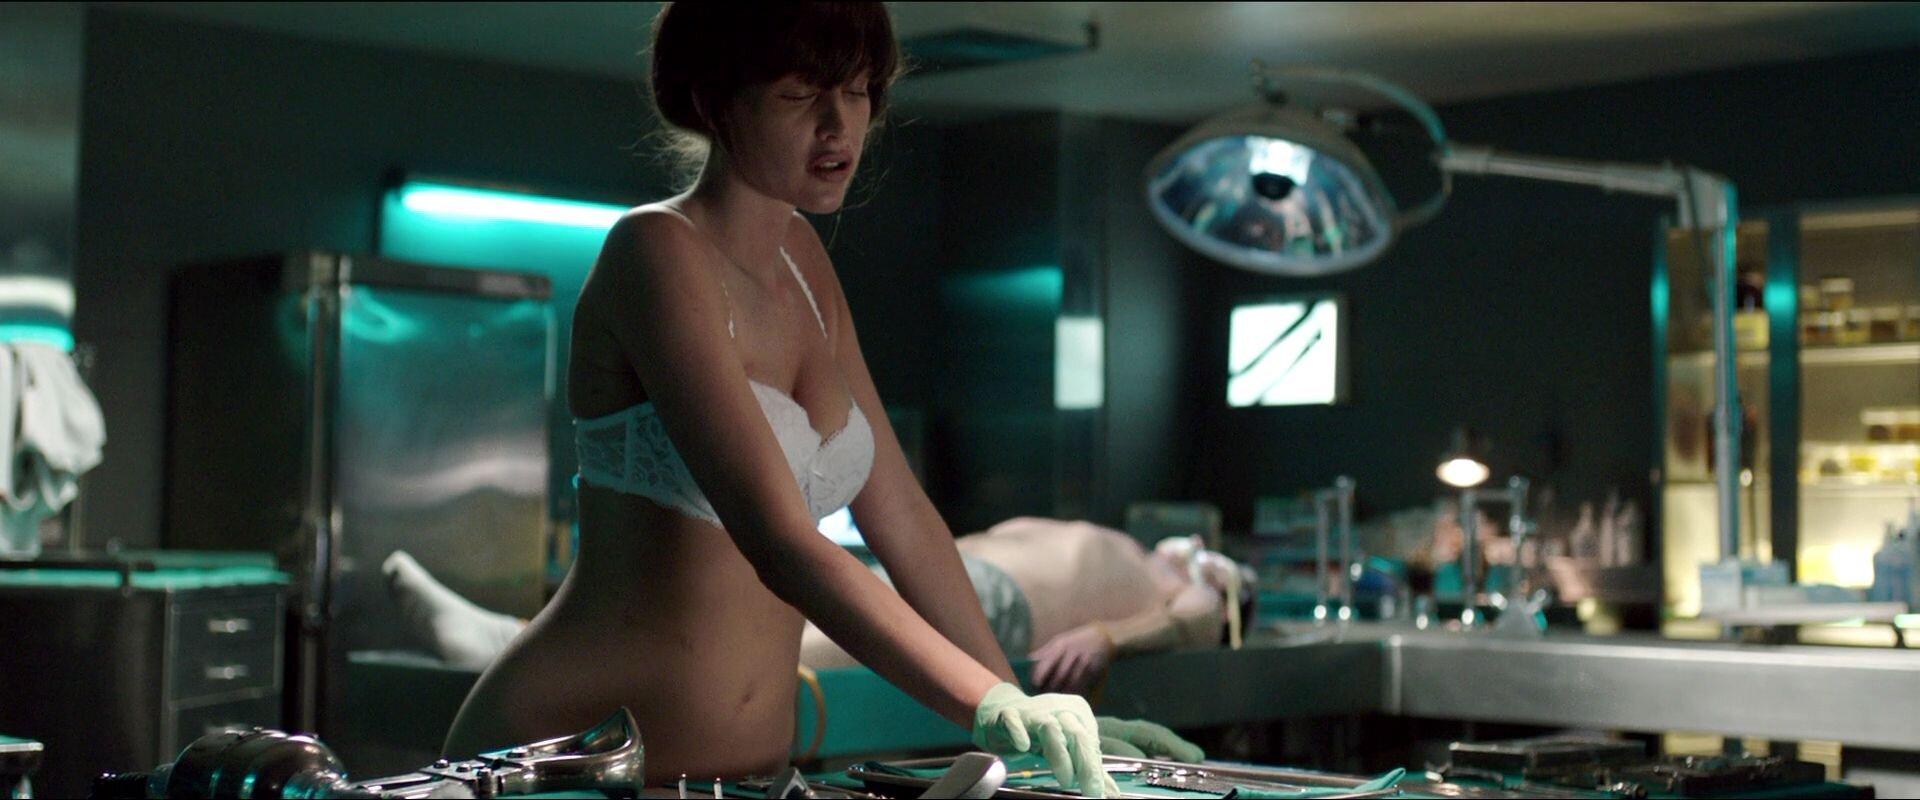 Nurse 3D - Operating room